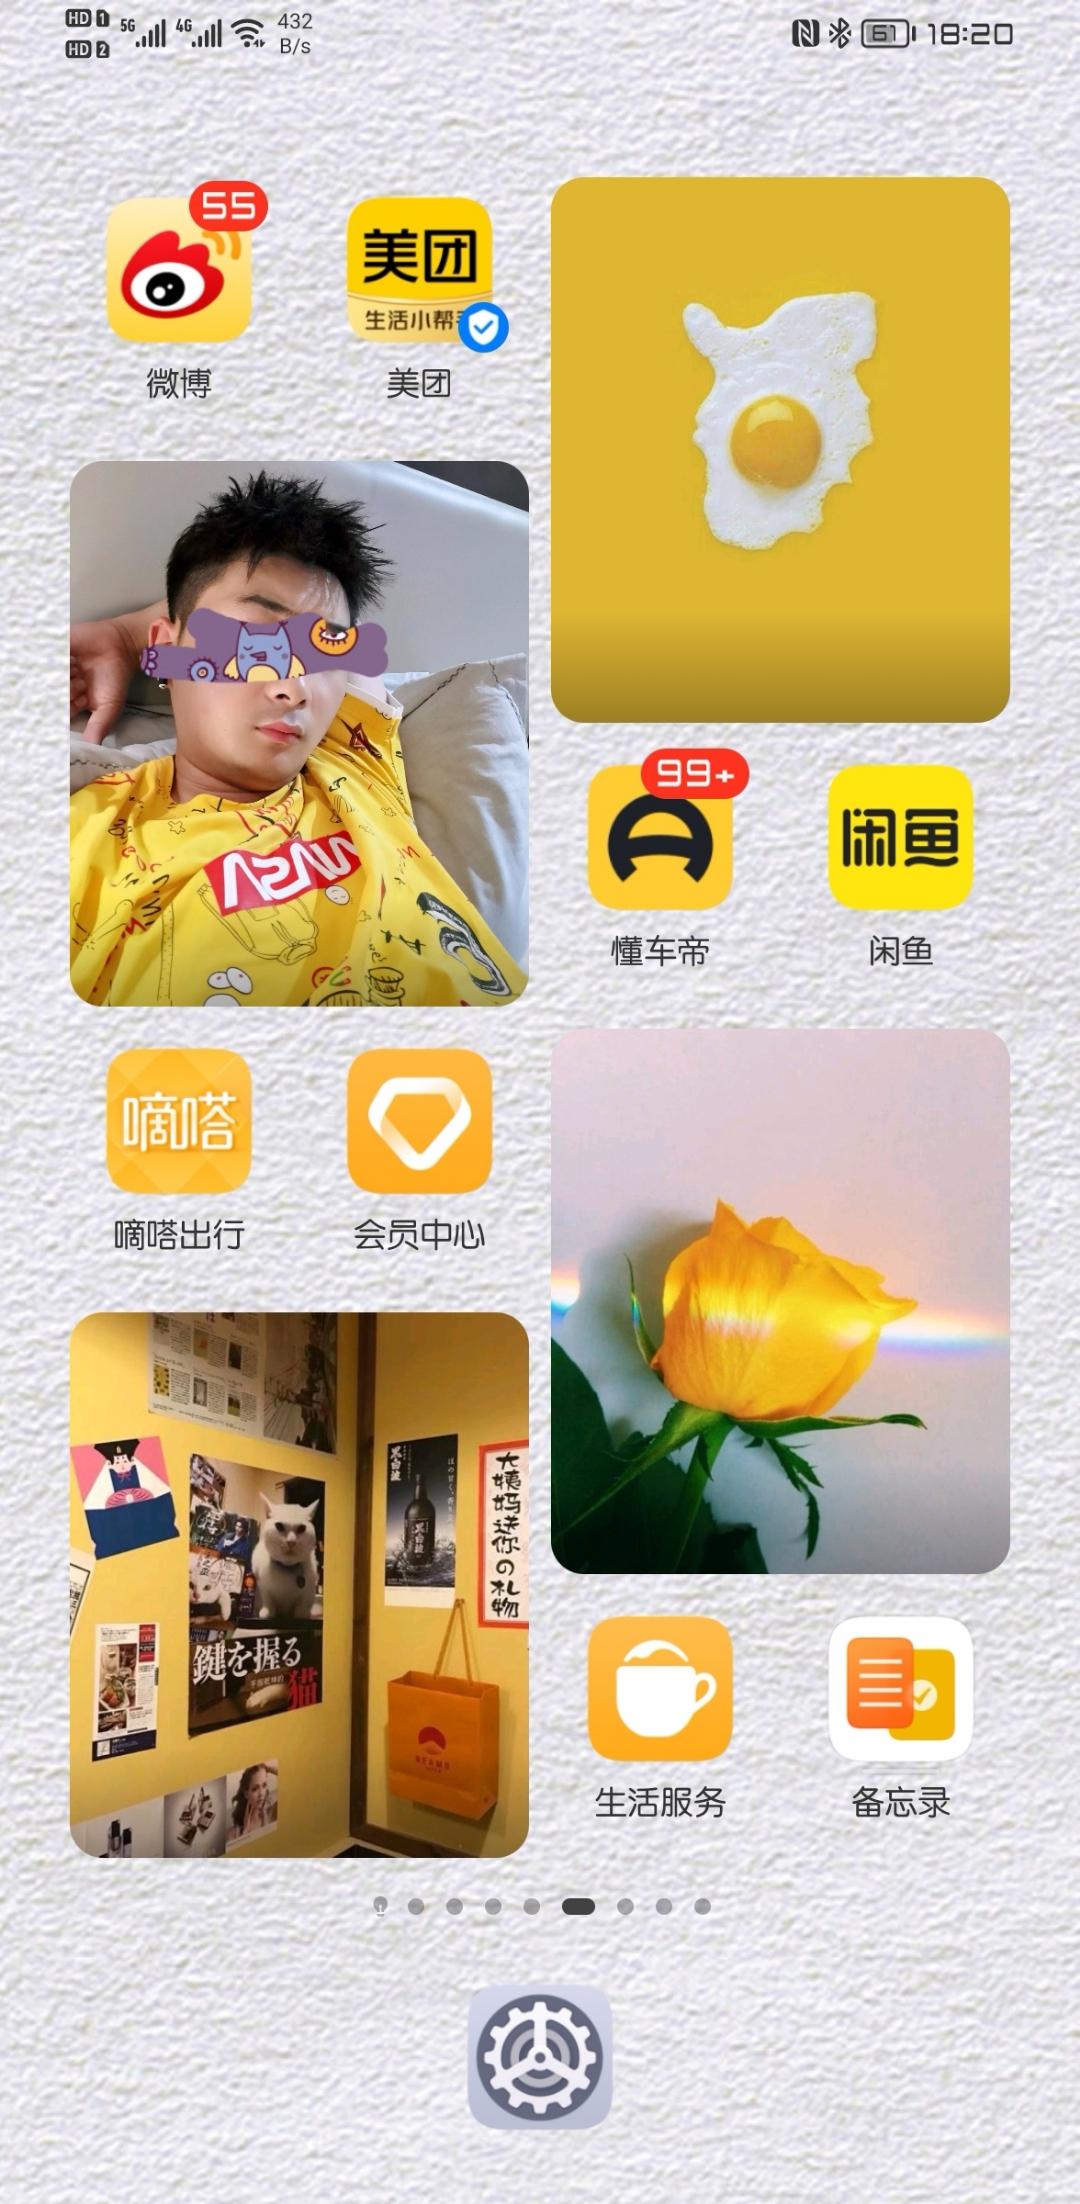 Screenshot_20210805_182034_com.huawei.android.launcher_edit_726923181309391.jpg